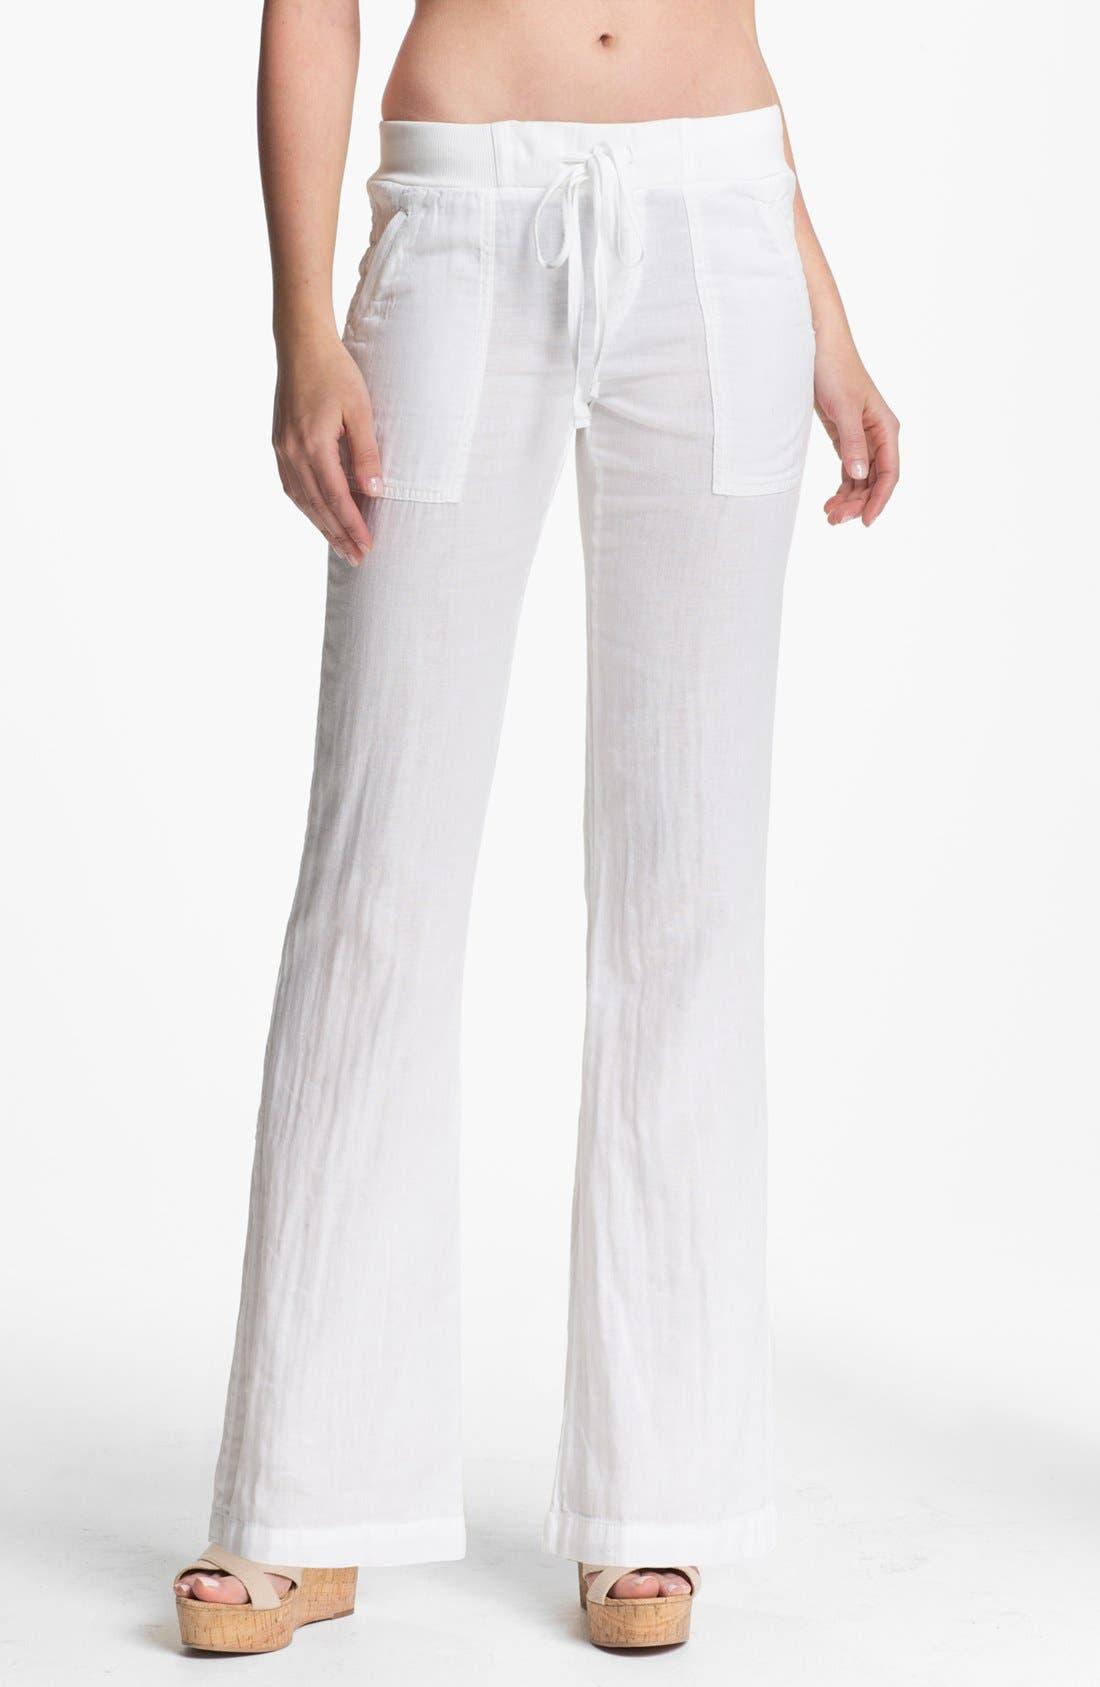 Alternate Image 1 Selected - Splendid 'Hermosa' Drawstring Pants